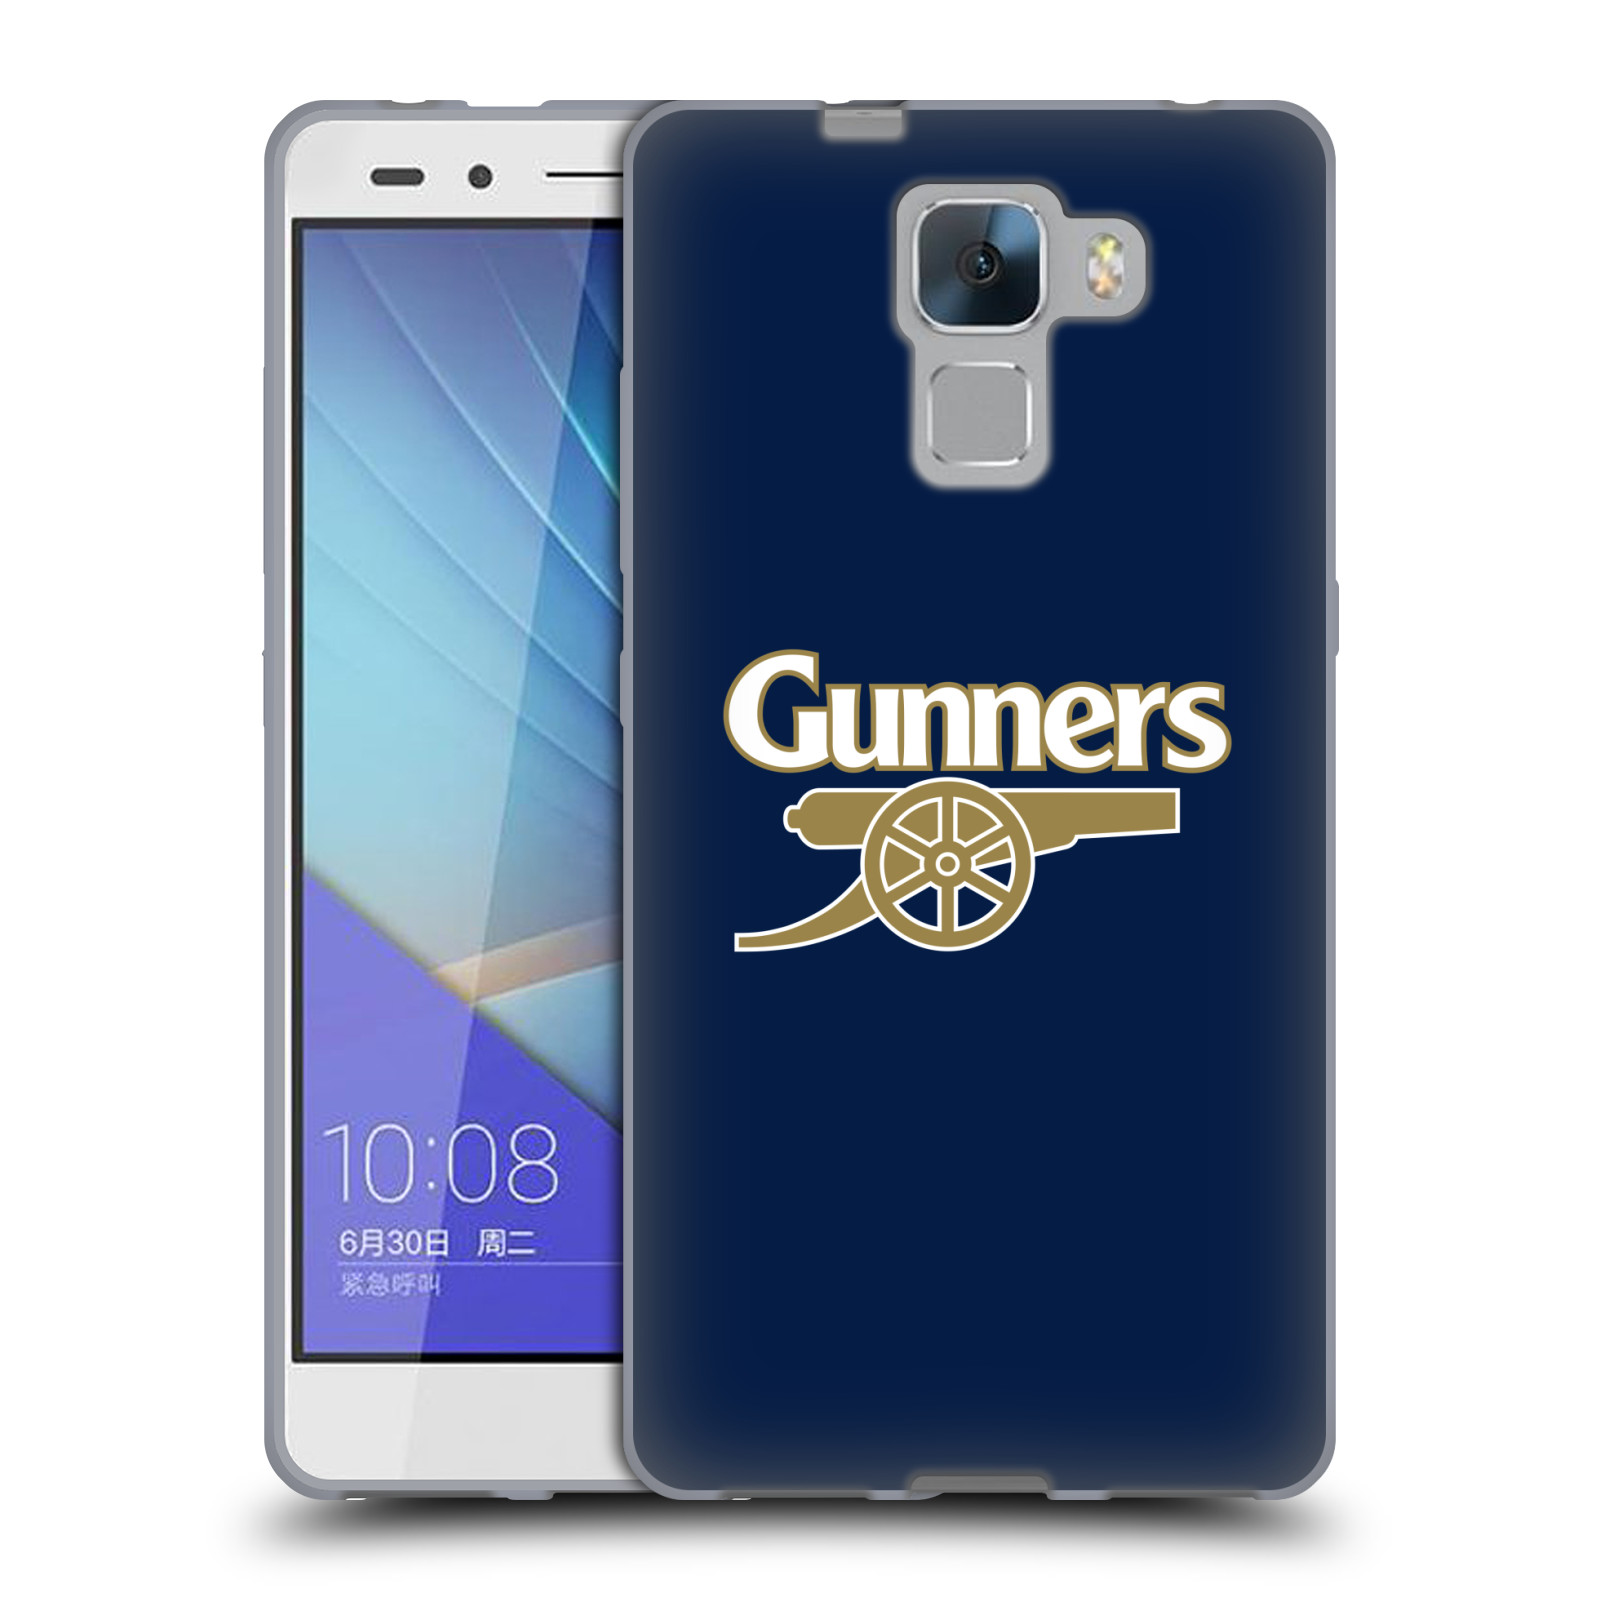 Silikonové pouzdro na mobil Honor 7 - Head Case - Arsenal FC - Gunners